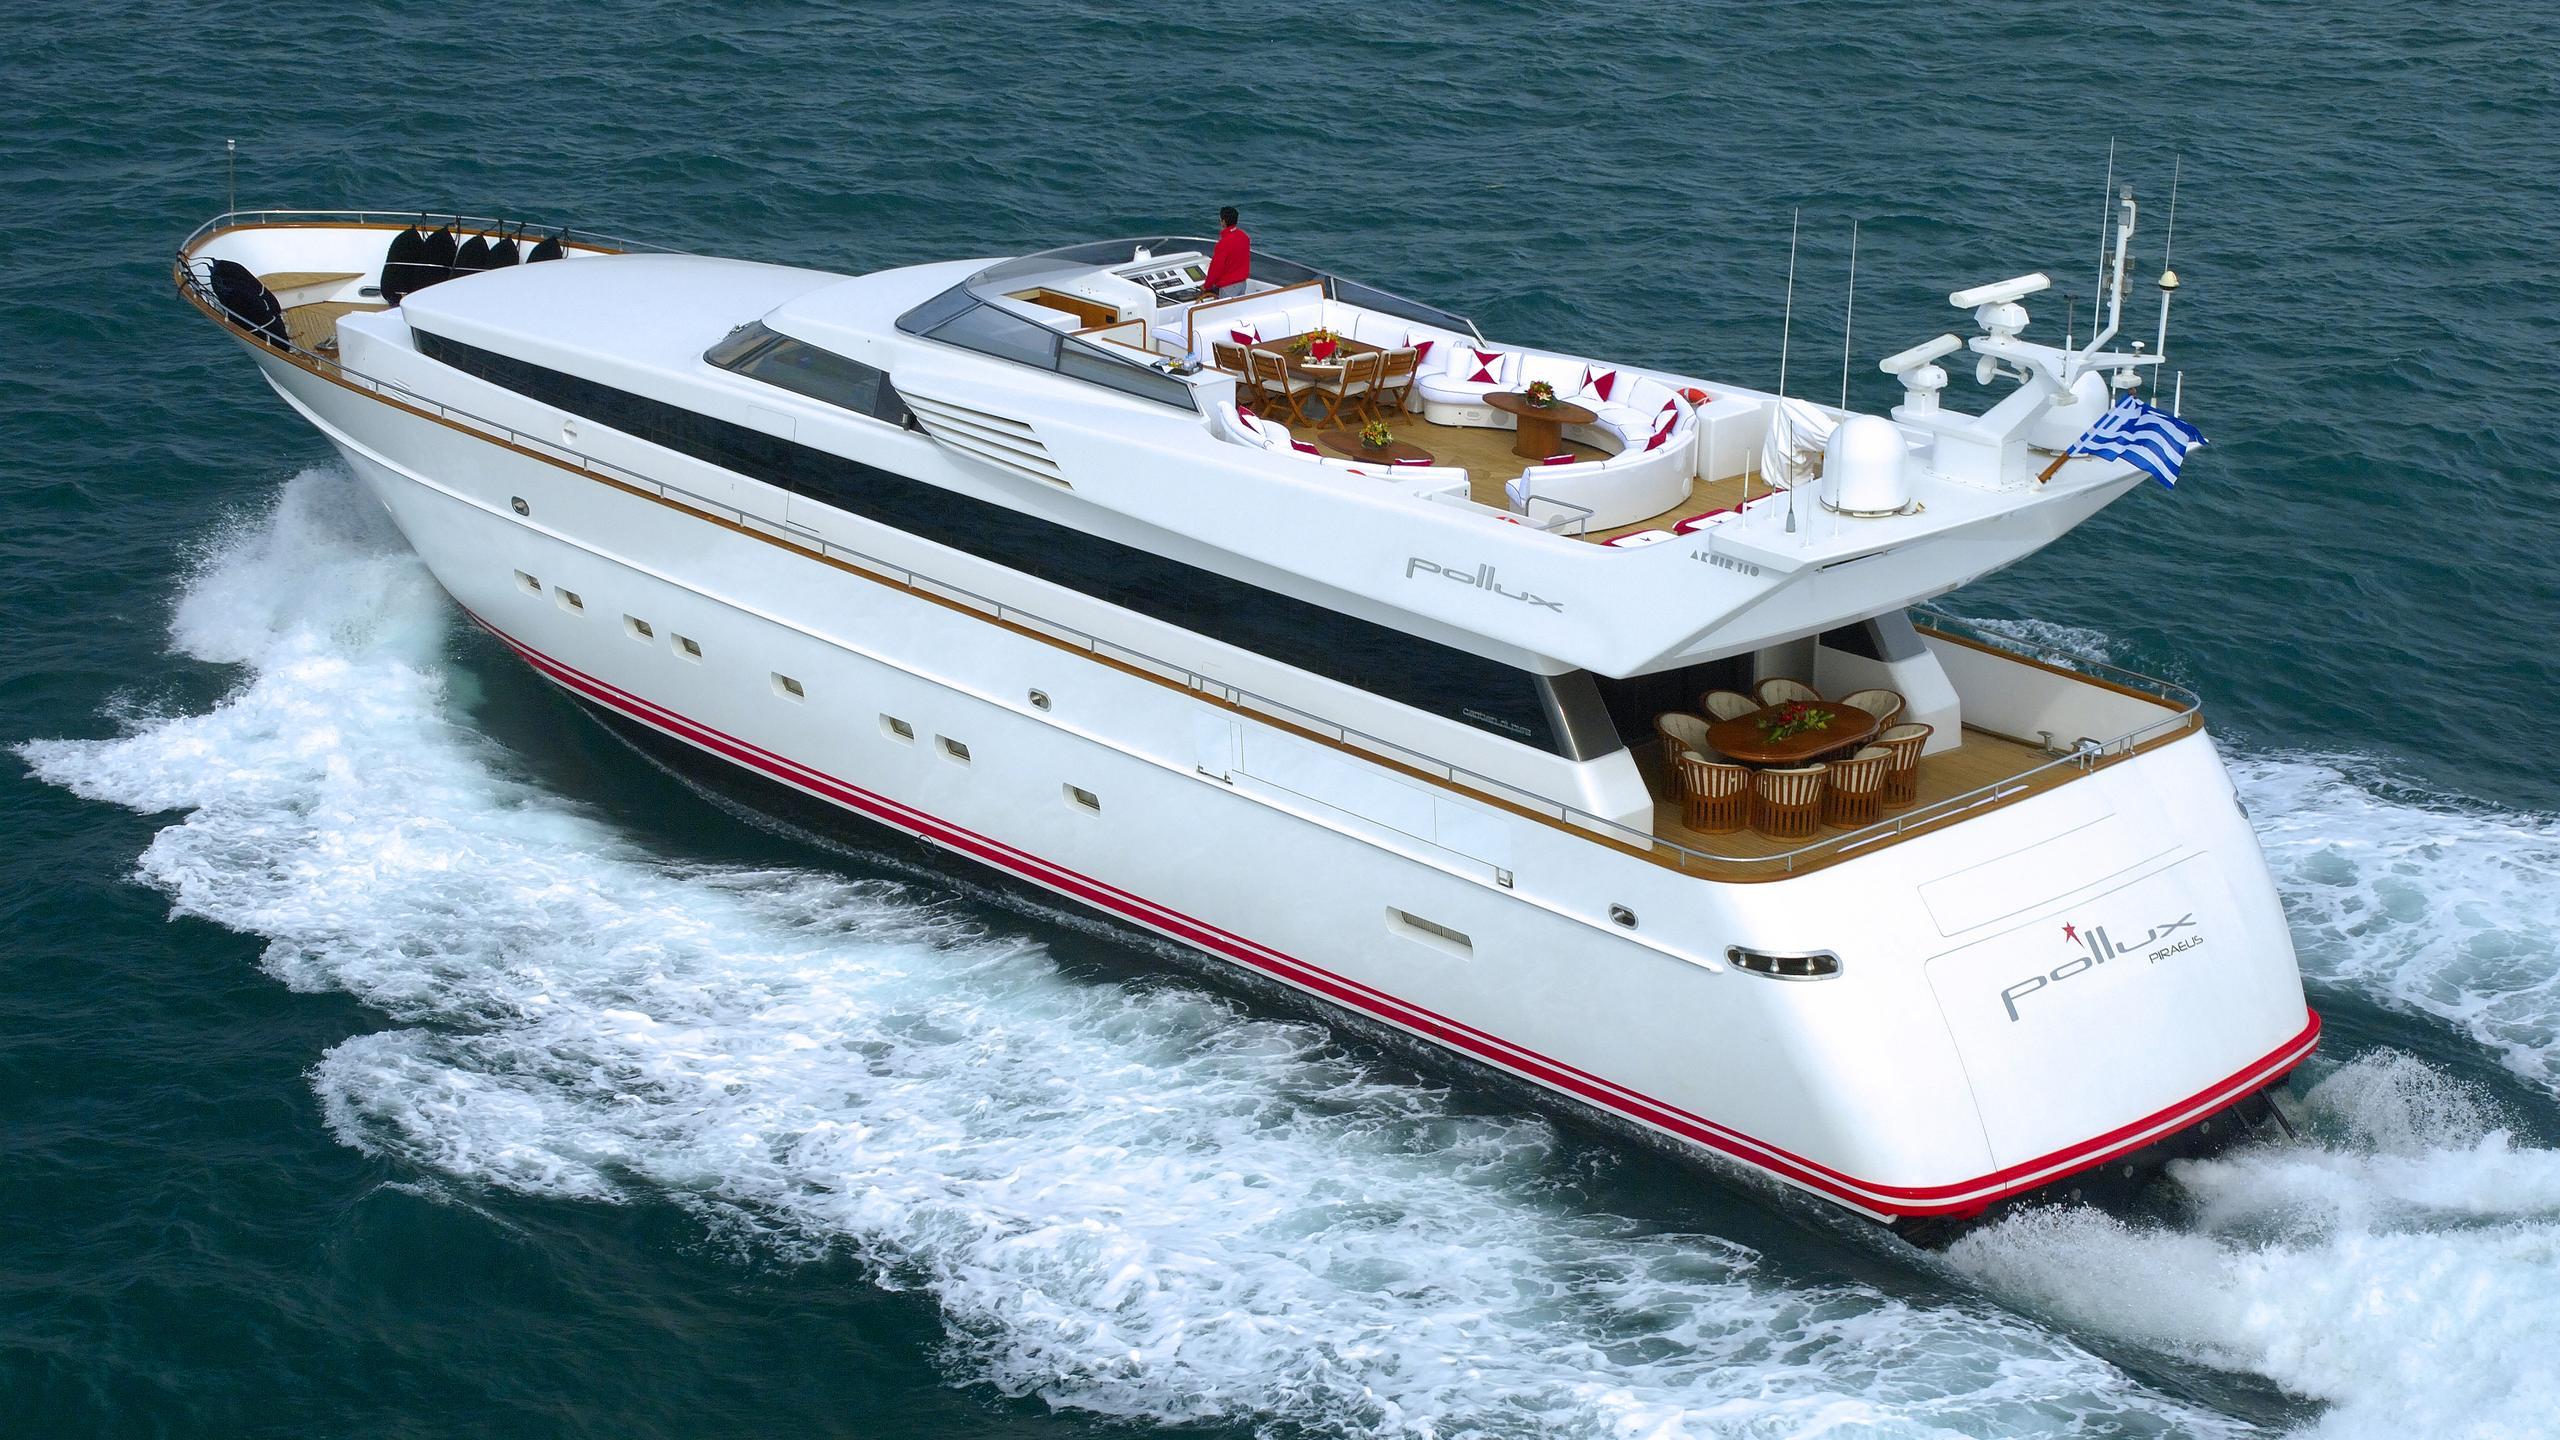 pollux-yacht-running